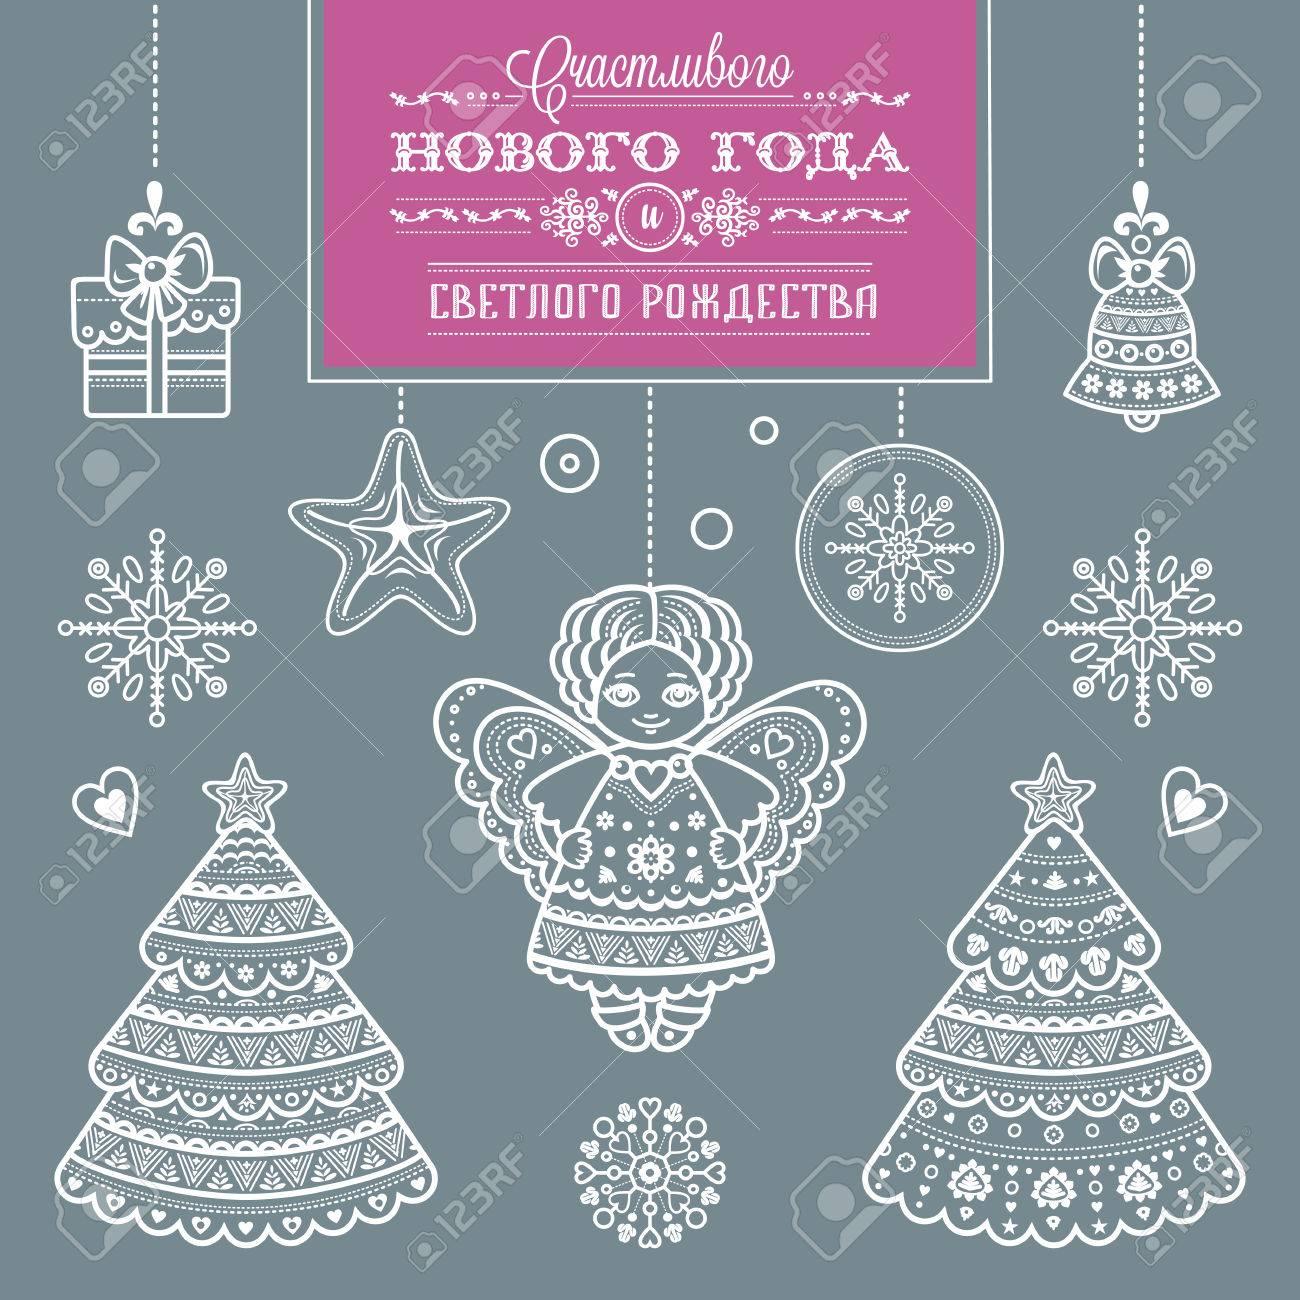 Greeting card cyrillic russian new year russian font happy greeting card cyrillic russian new year russian font happy new year message kristyandbryce Choice Image